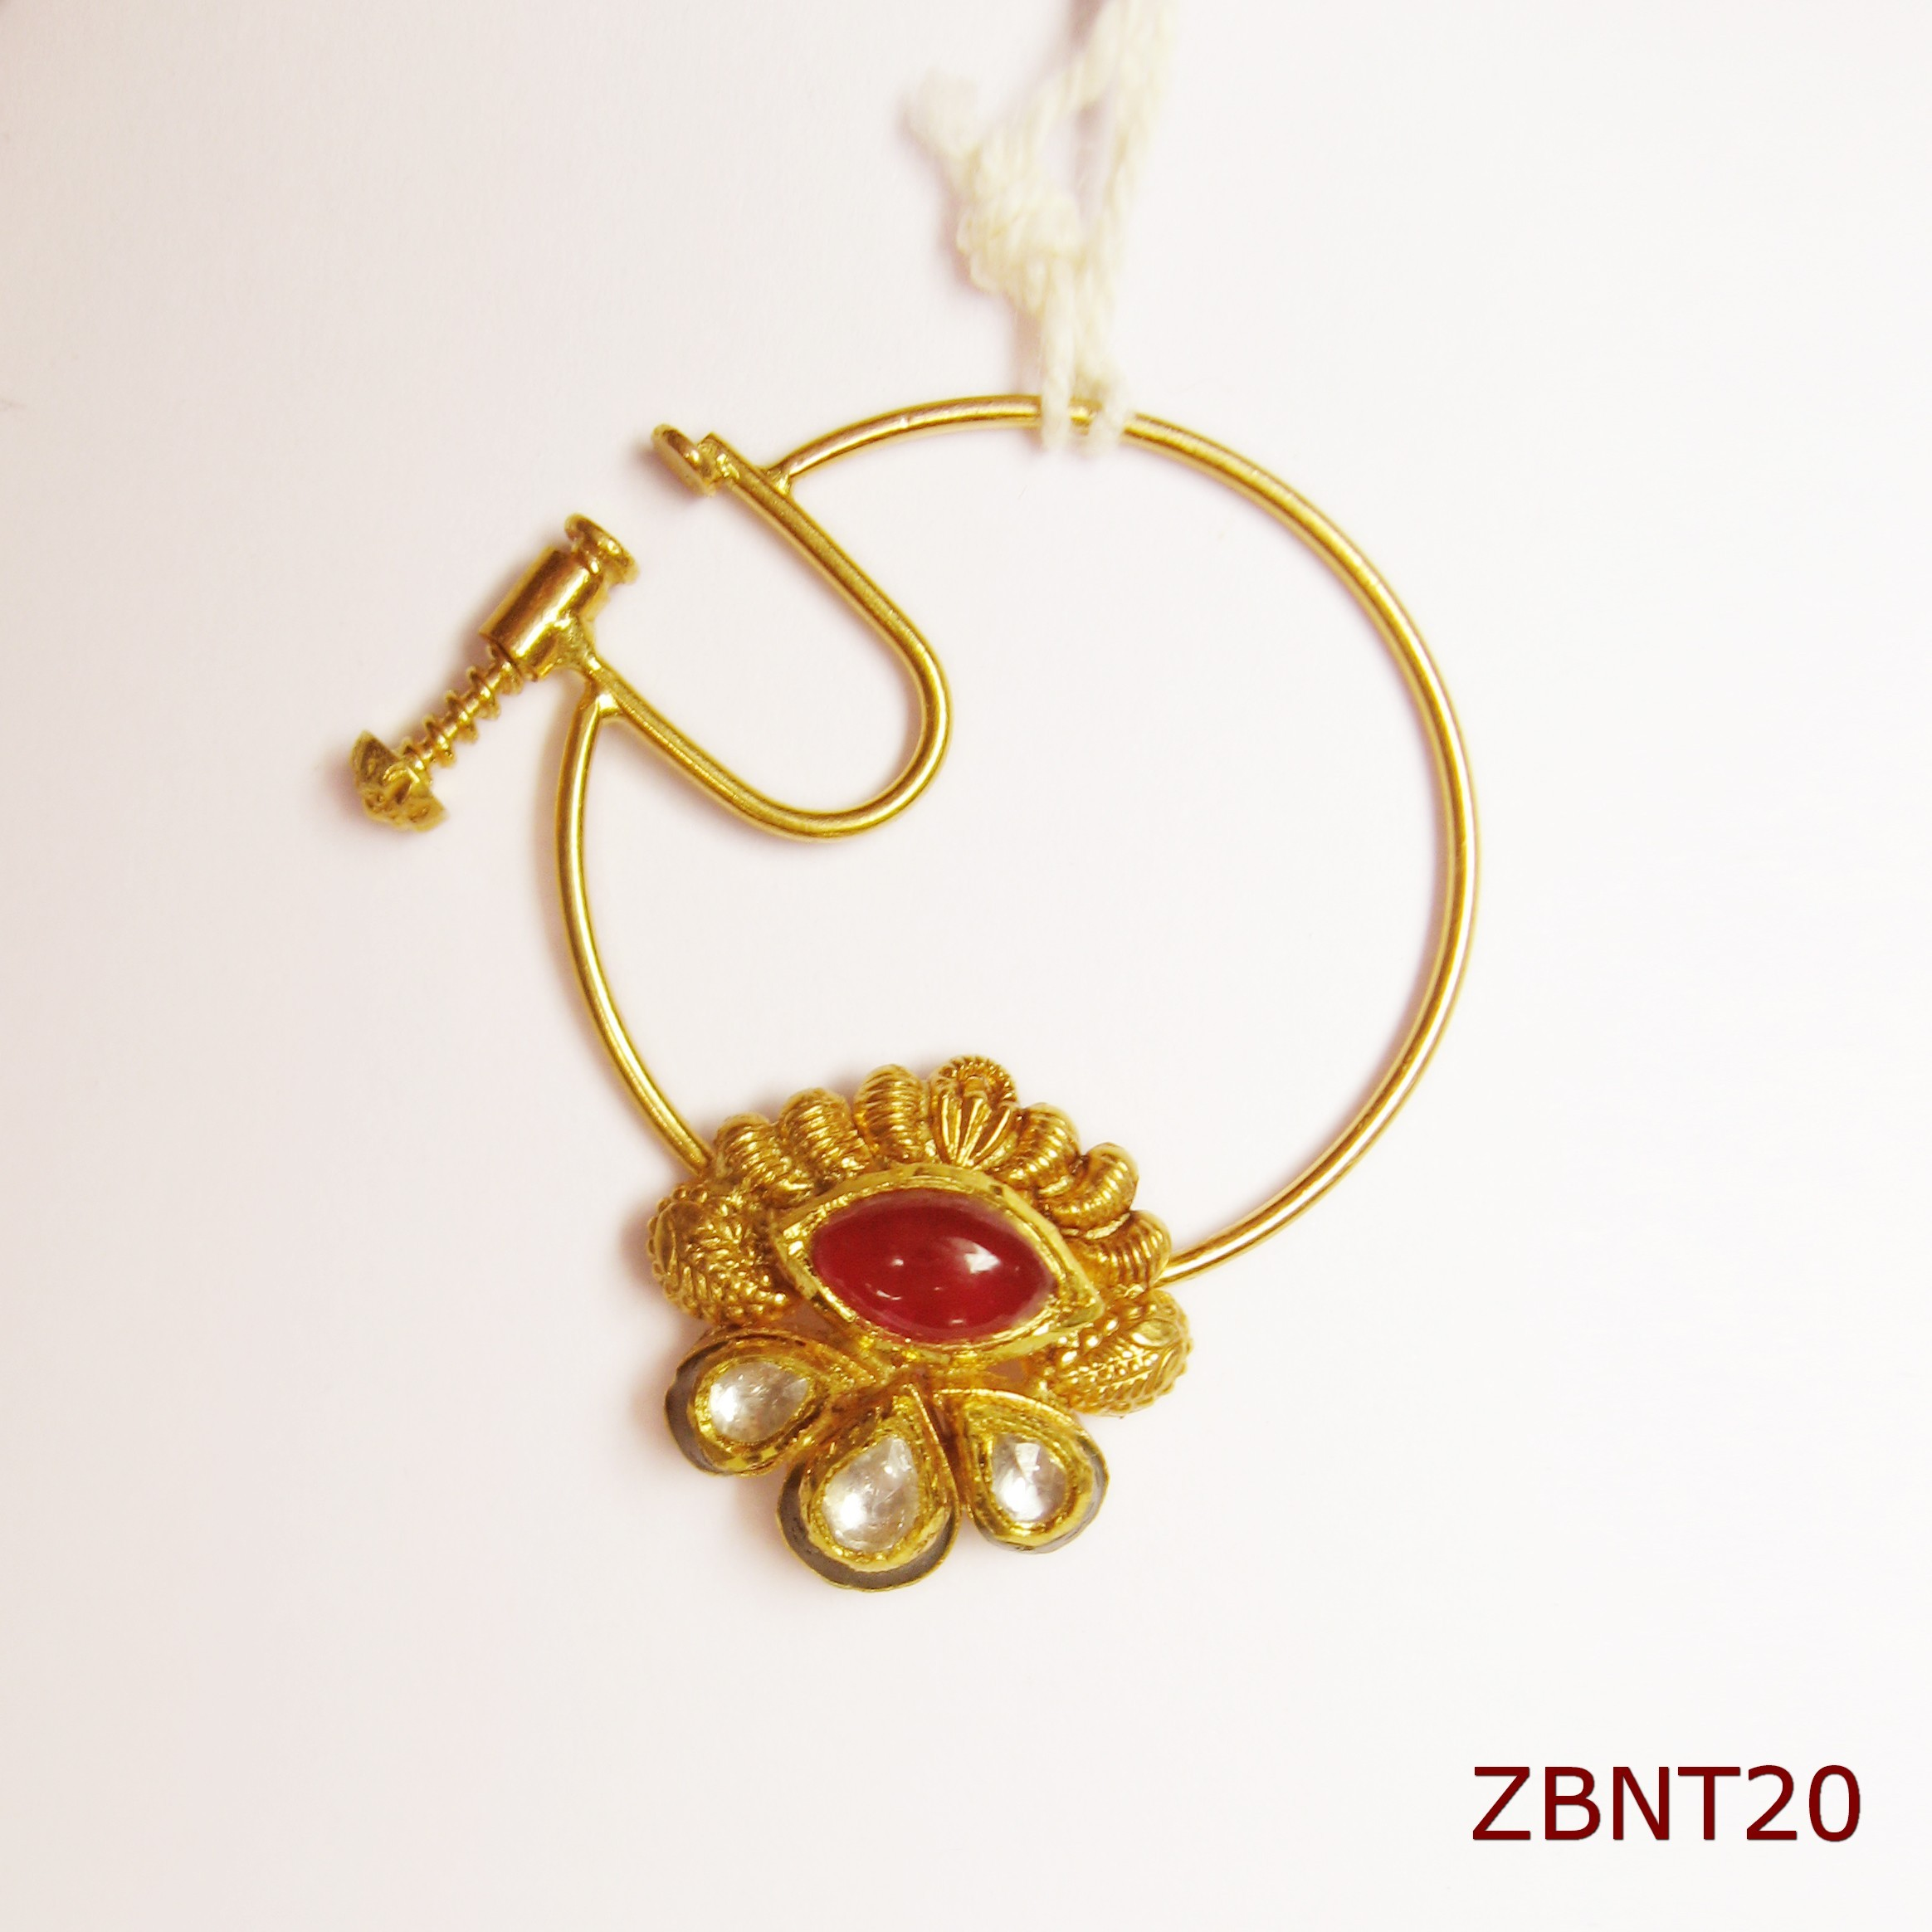 ZBNT20